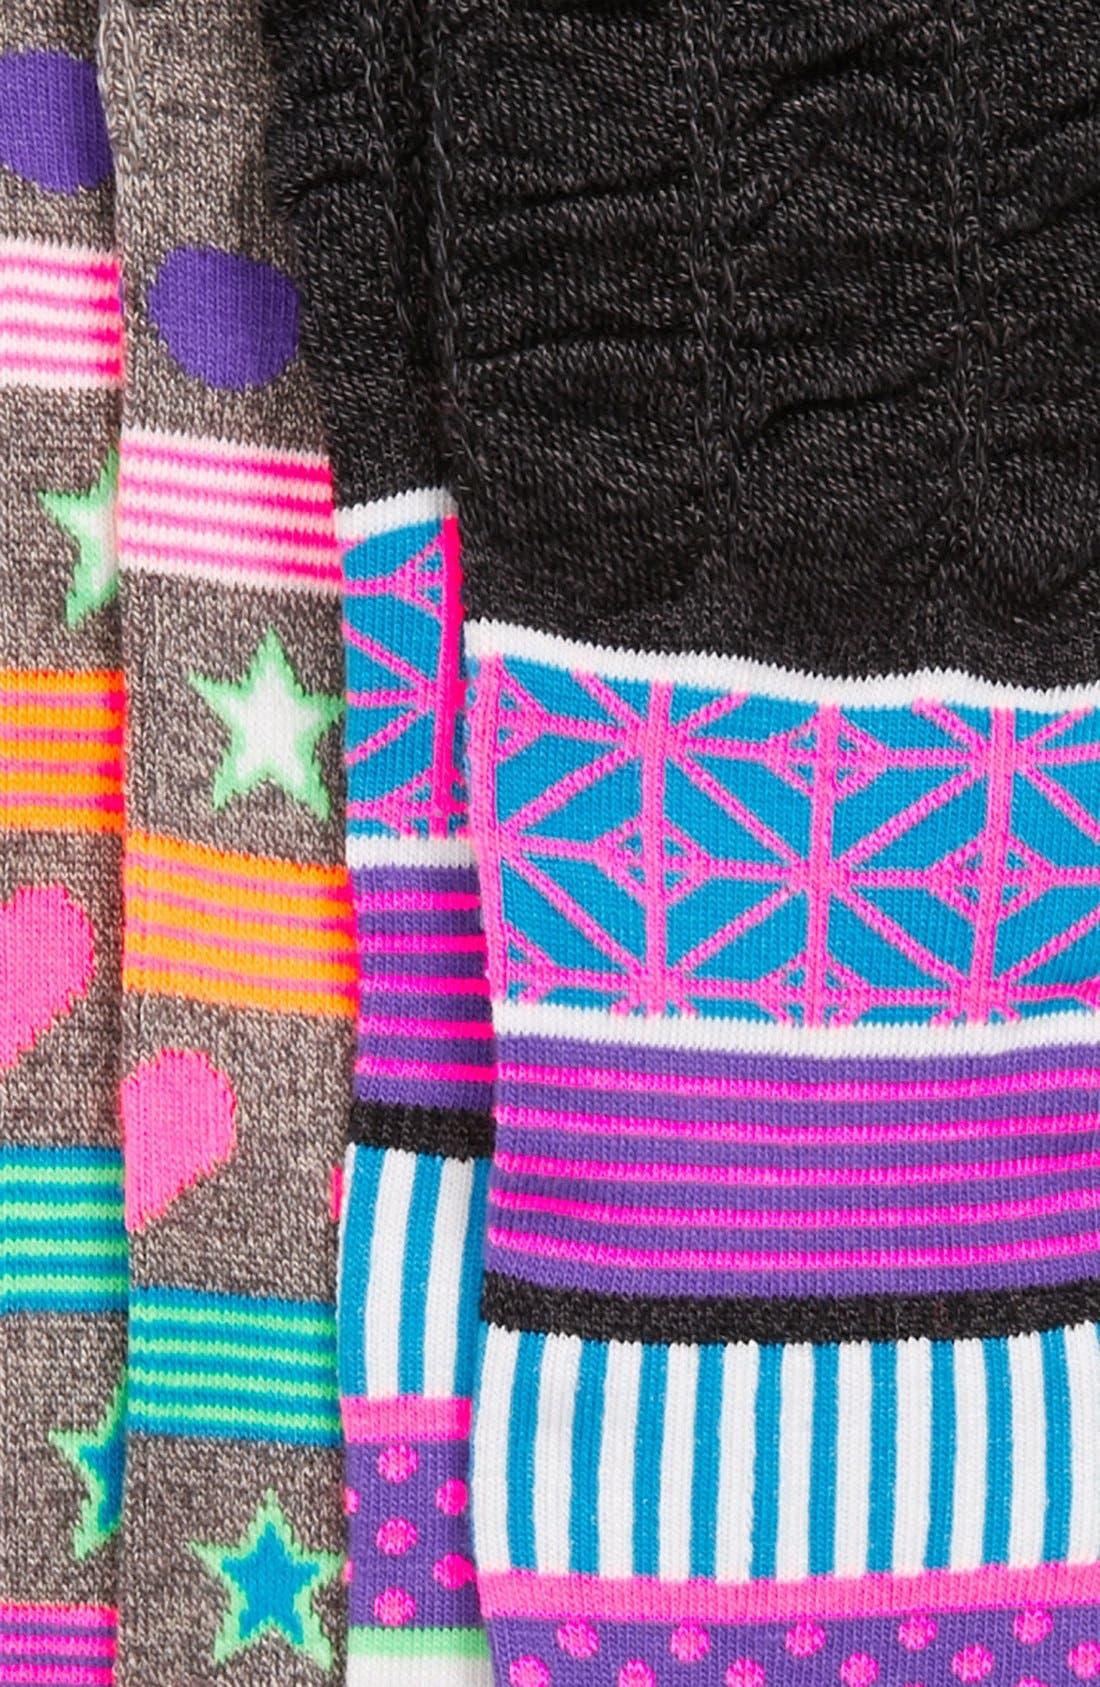 Alternate Image 2  - Nordstrom 'You're Glowing' Knee High Socks (2-Pack) (Toddler Girls, Little Girls & Big Girls)